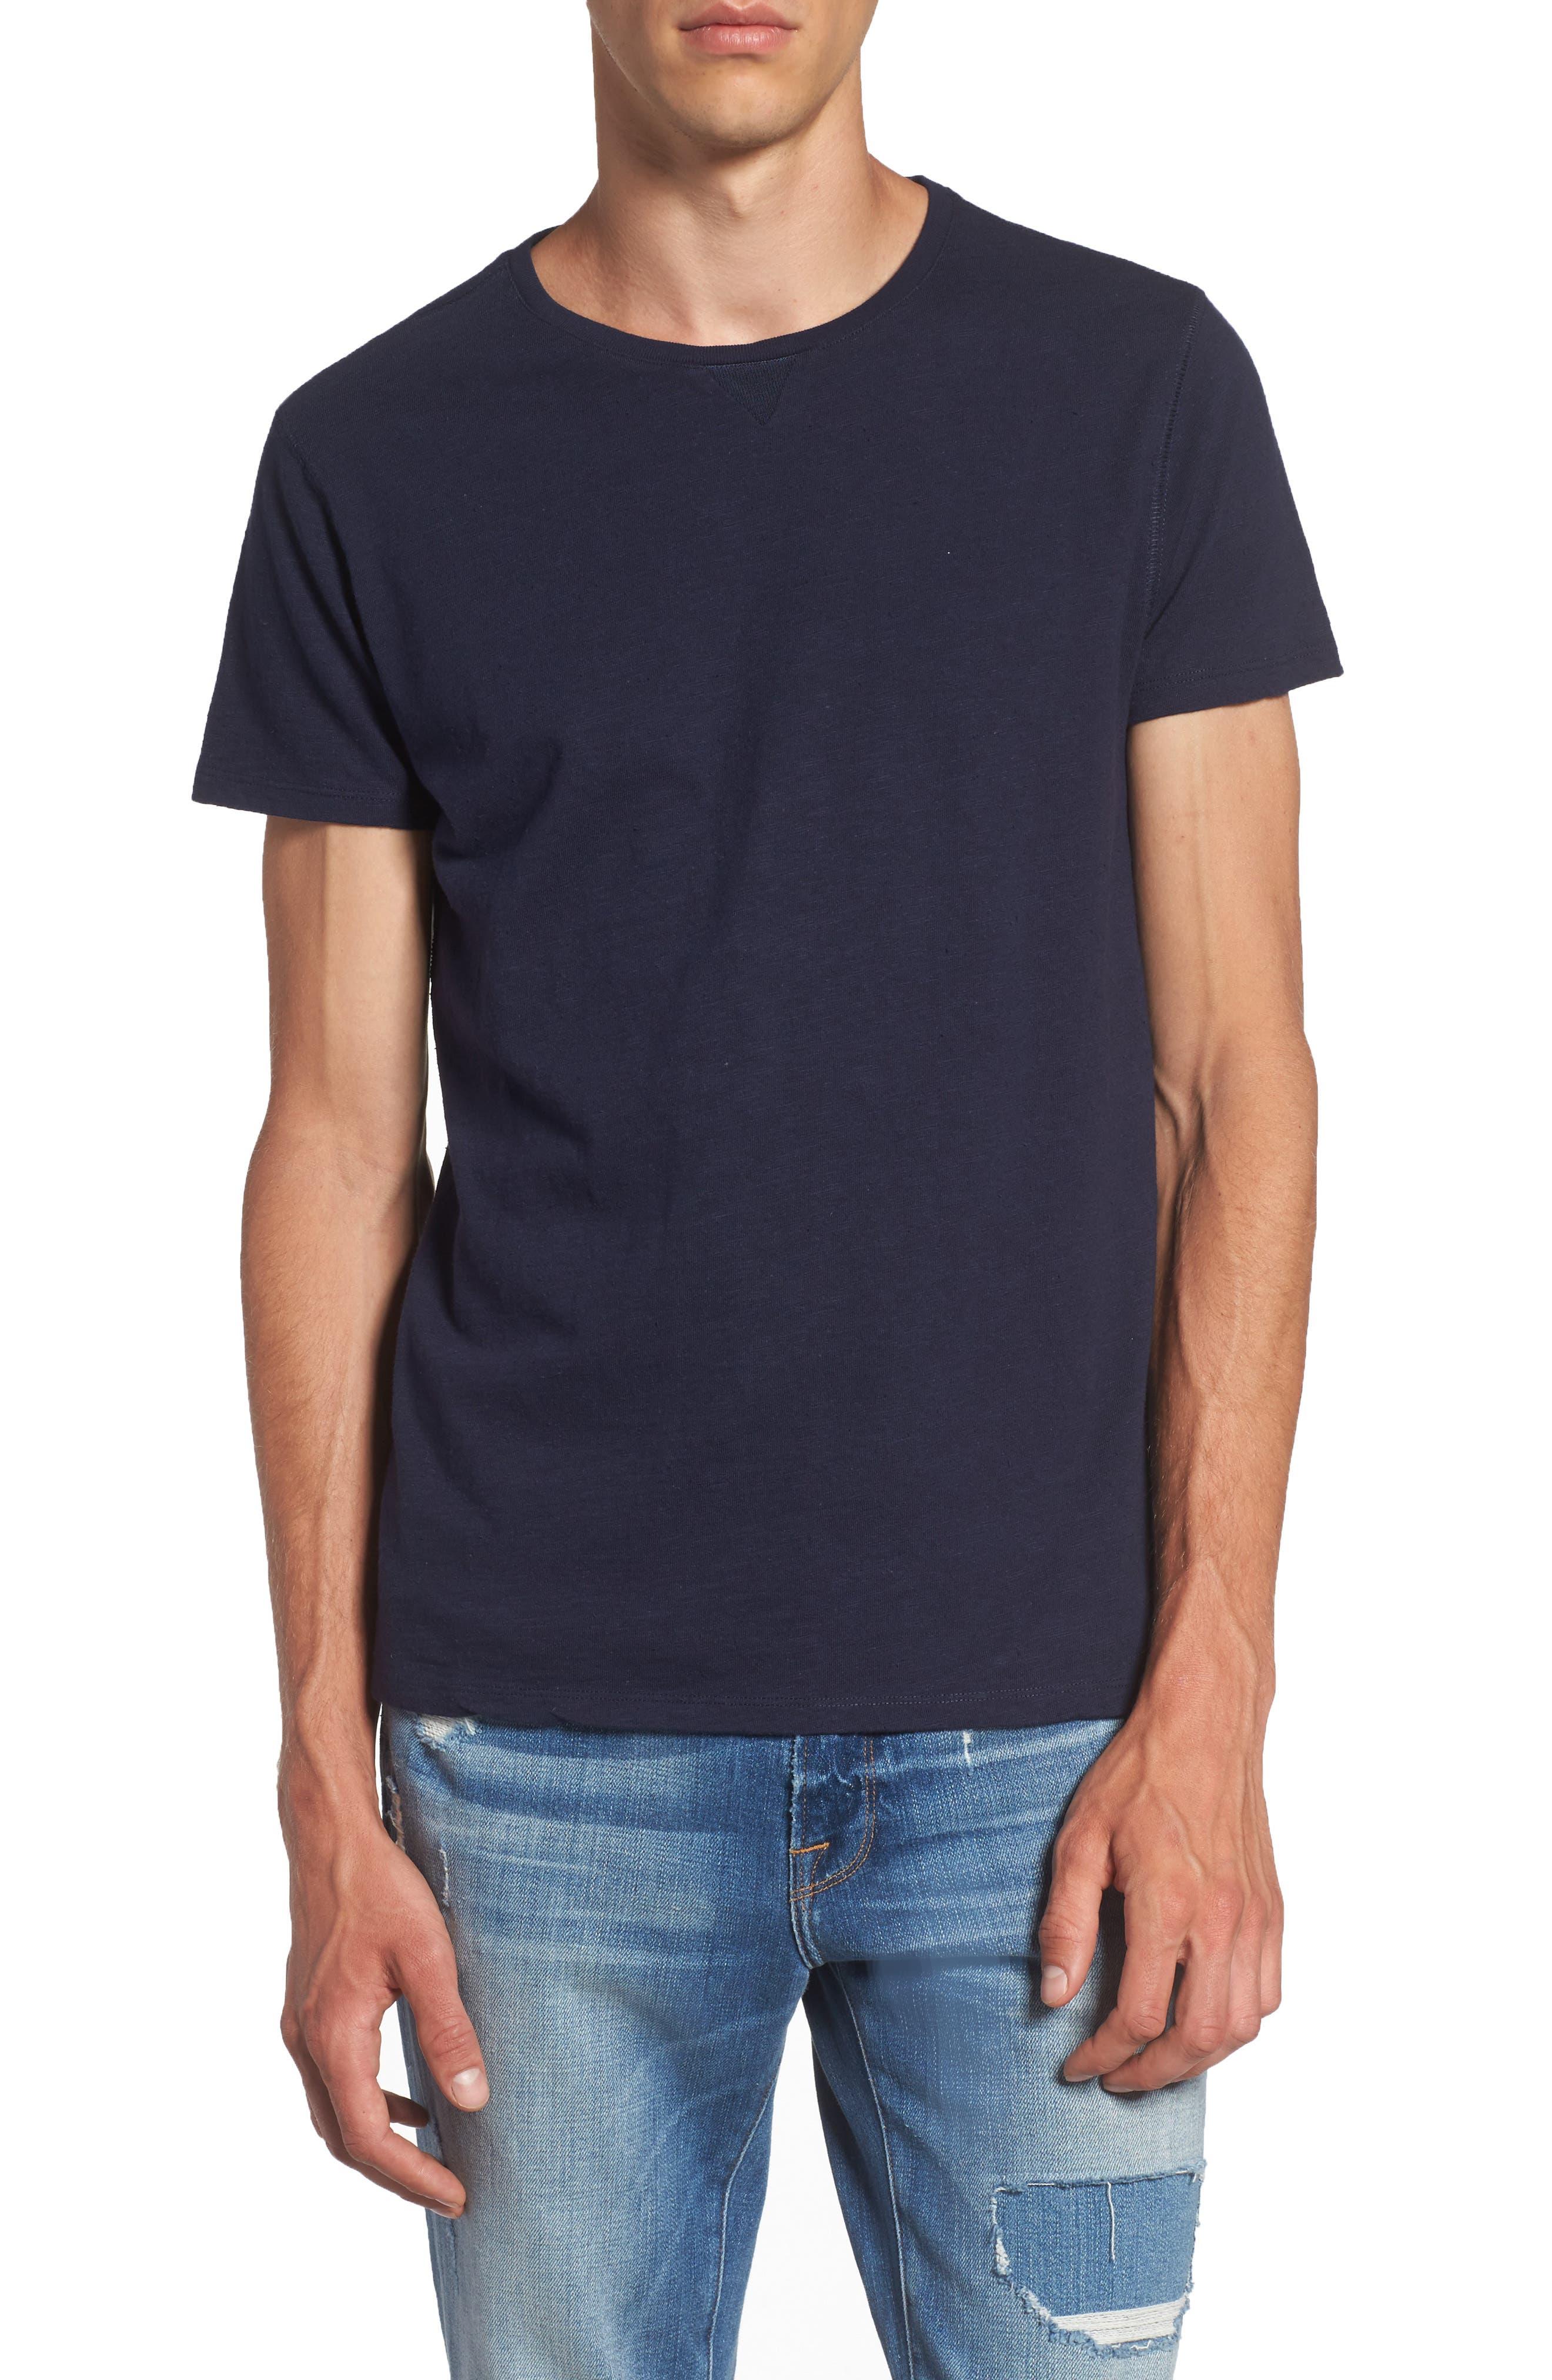 Main Image - Scotch & Soda Home Alone Classic T-Shirt